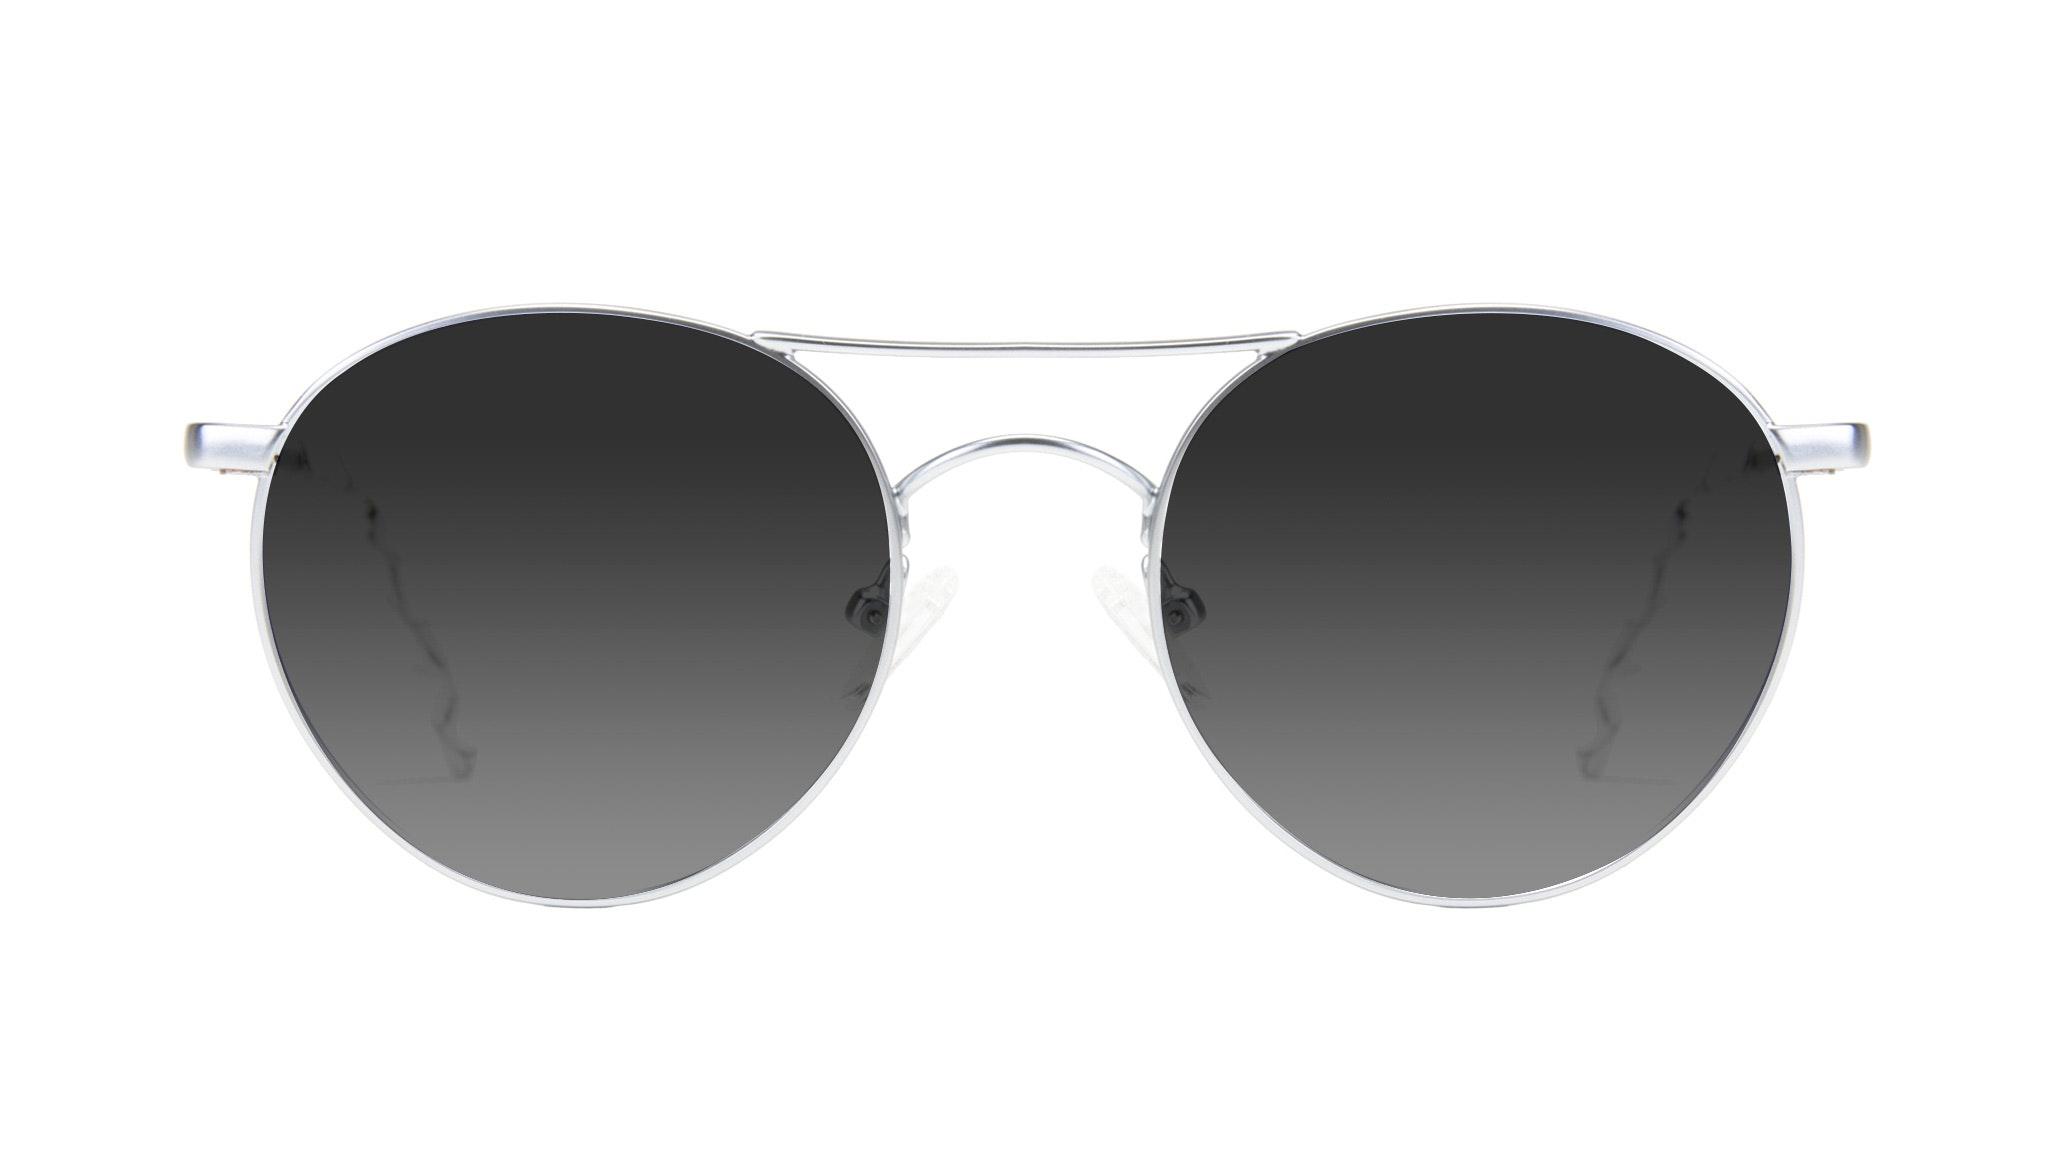 Affordable Fashion Glasses Aviator Round Sunglasses Women Chelsea Light Marble